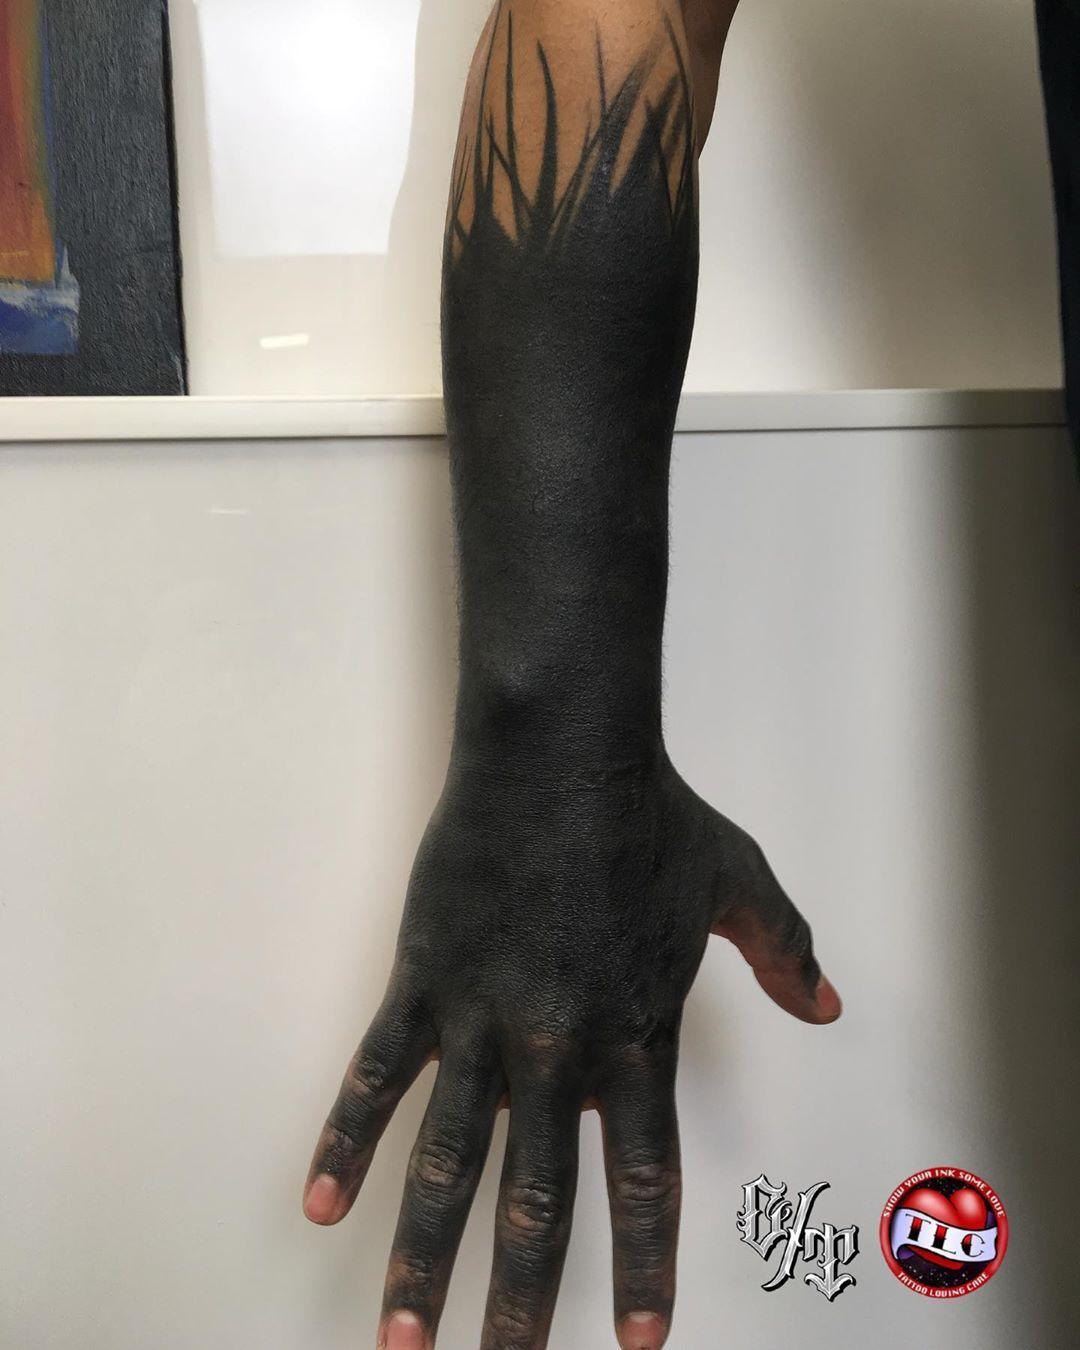 Blackout Healed Art Belfast Belfastcity B Hand Tattoos Belfast Tattoo Blackout Tattoo